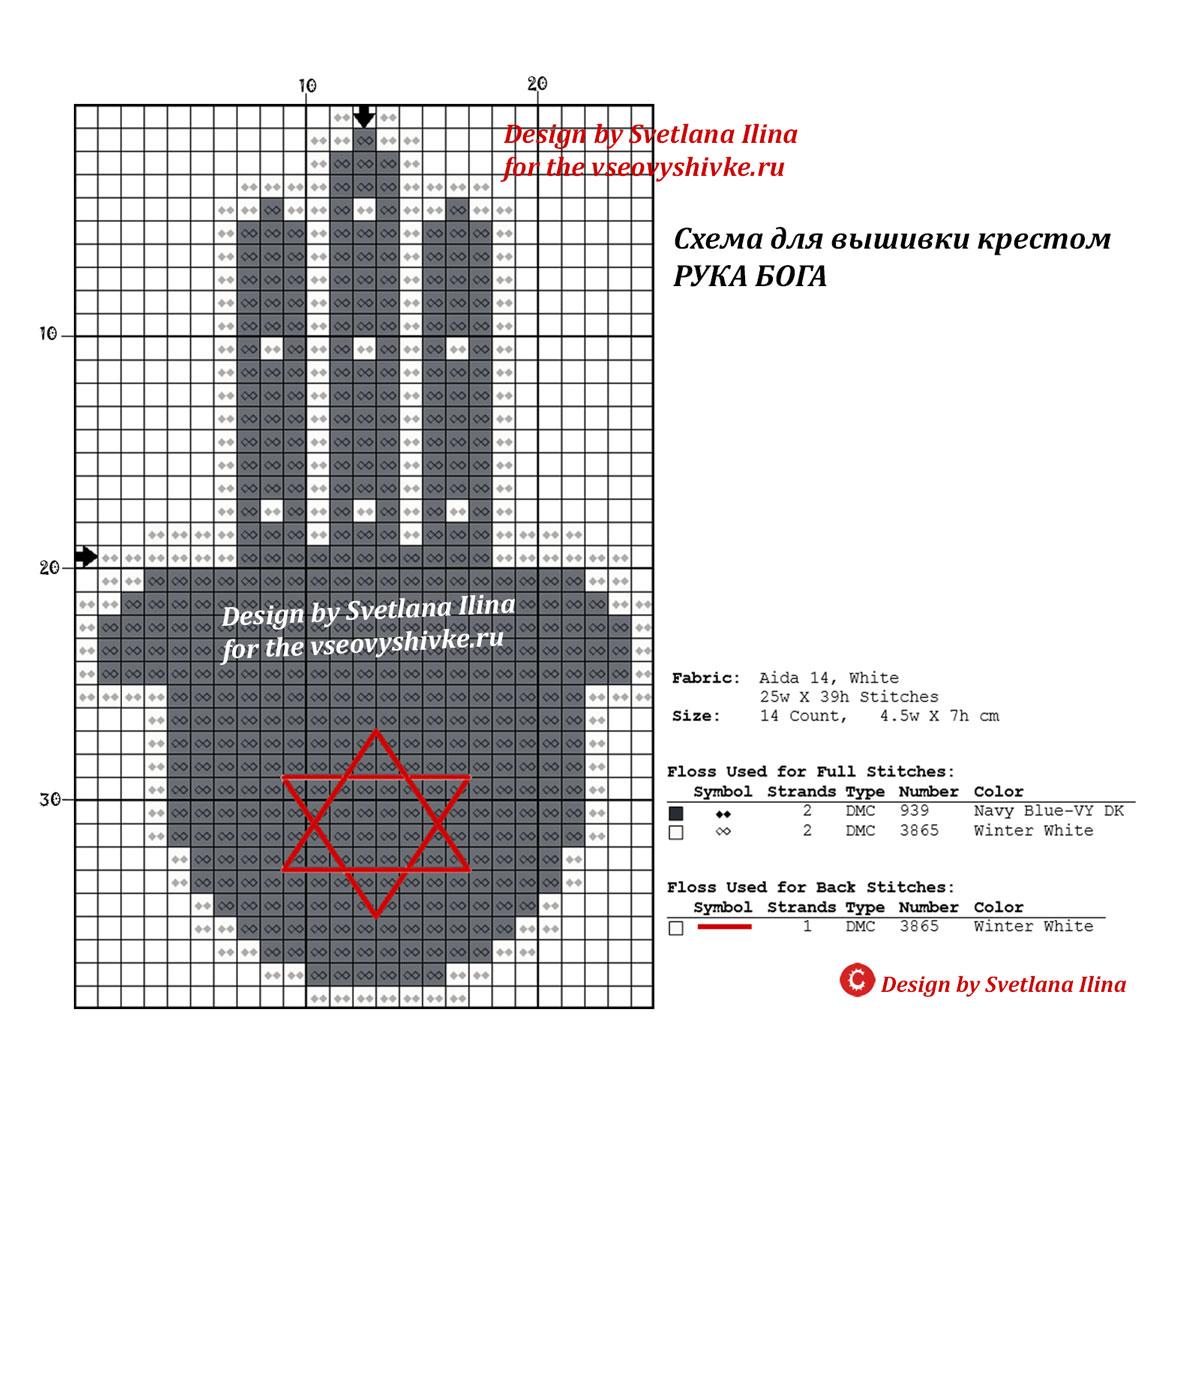 Вышивка крестом рука бога